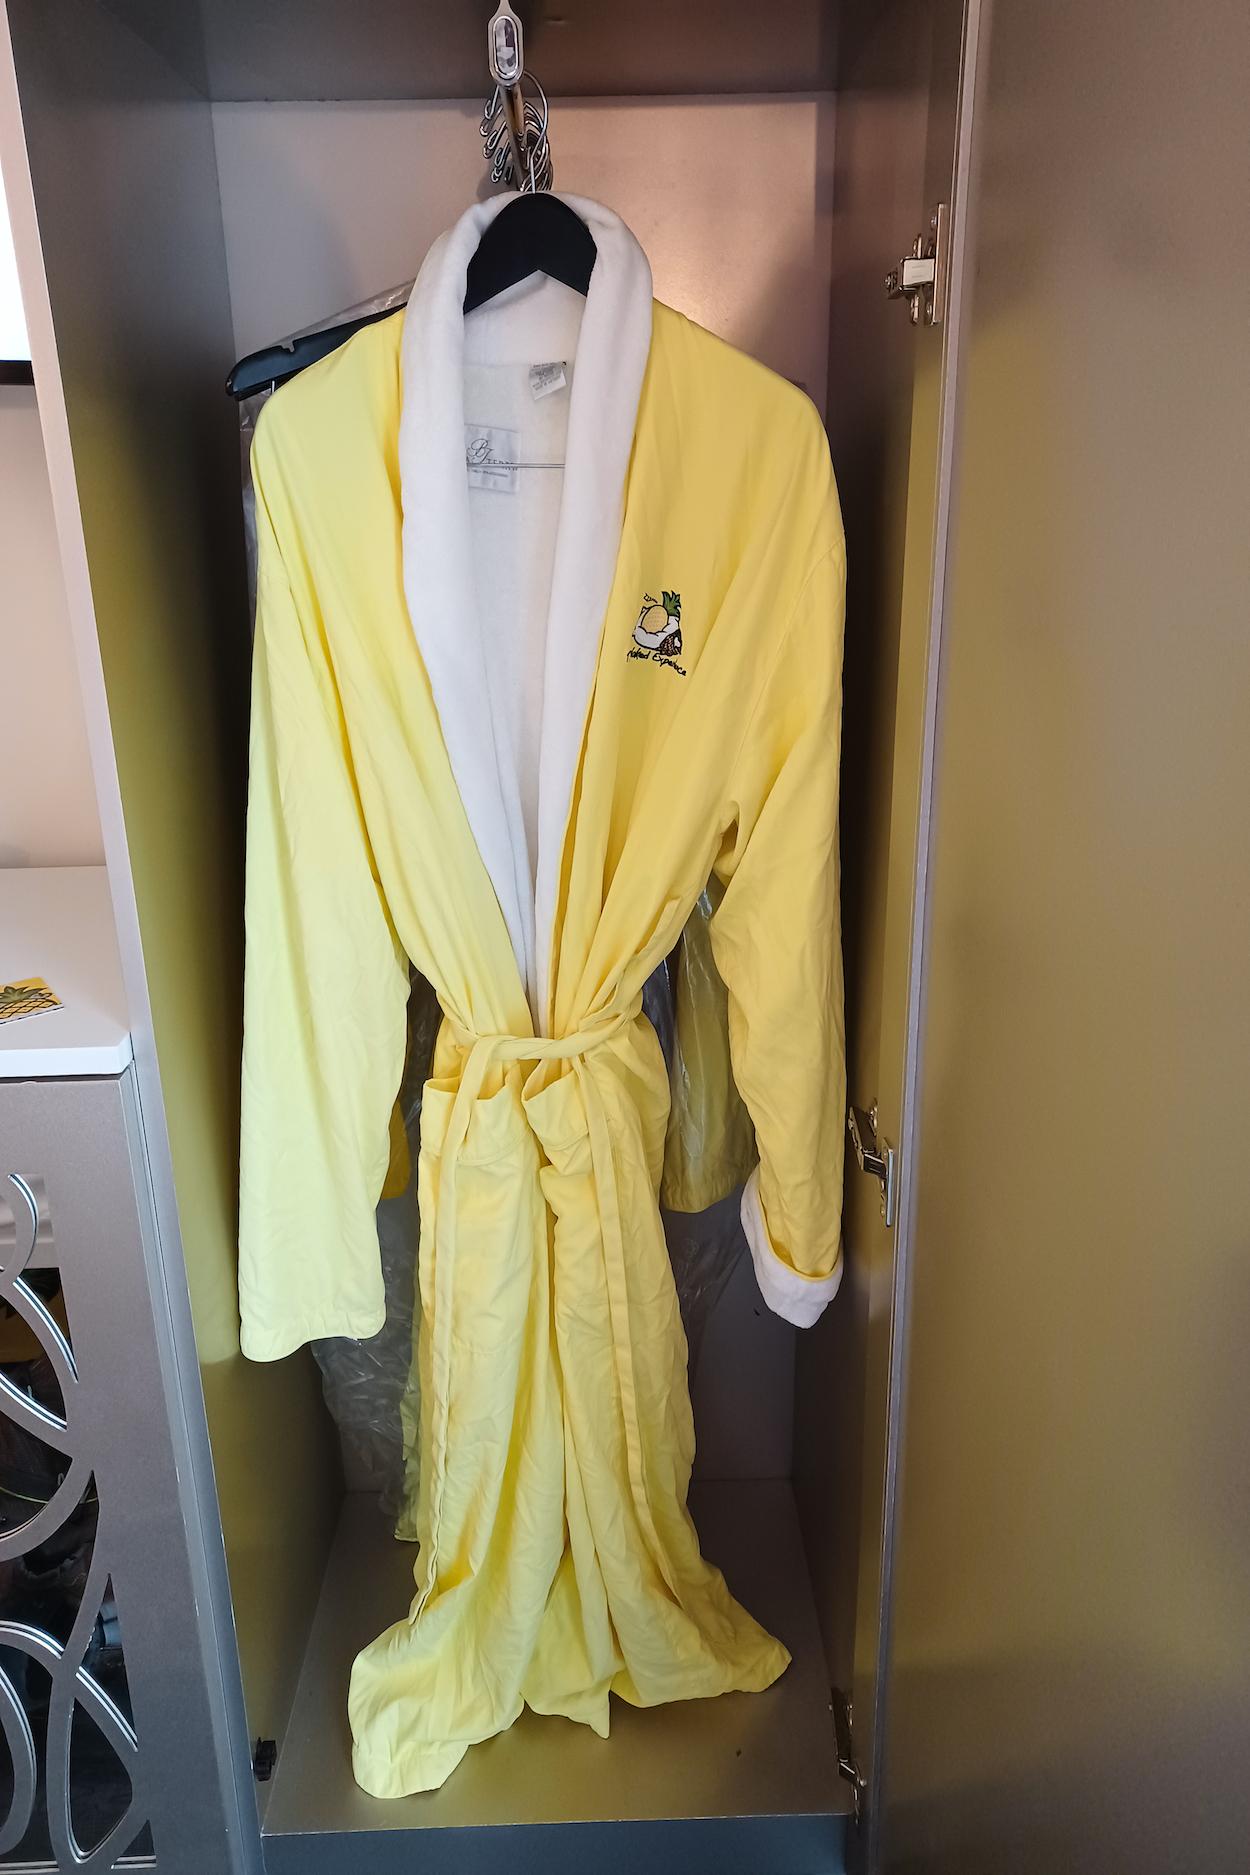 Plush yellow robe at StayPineapple Hotel New York City